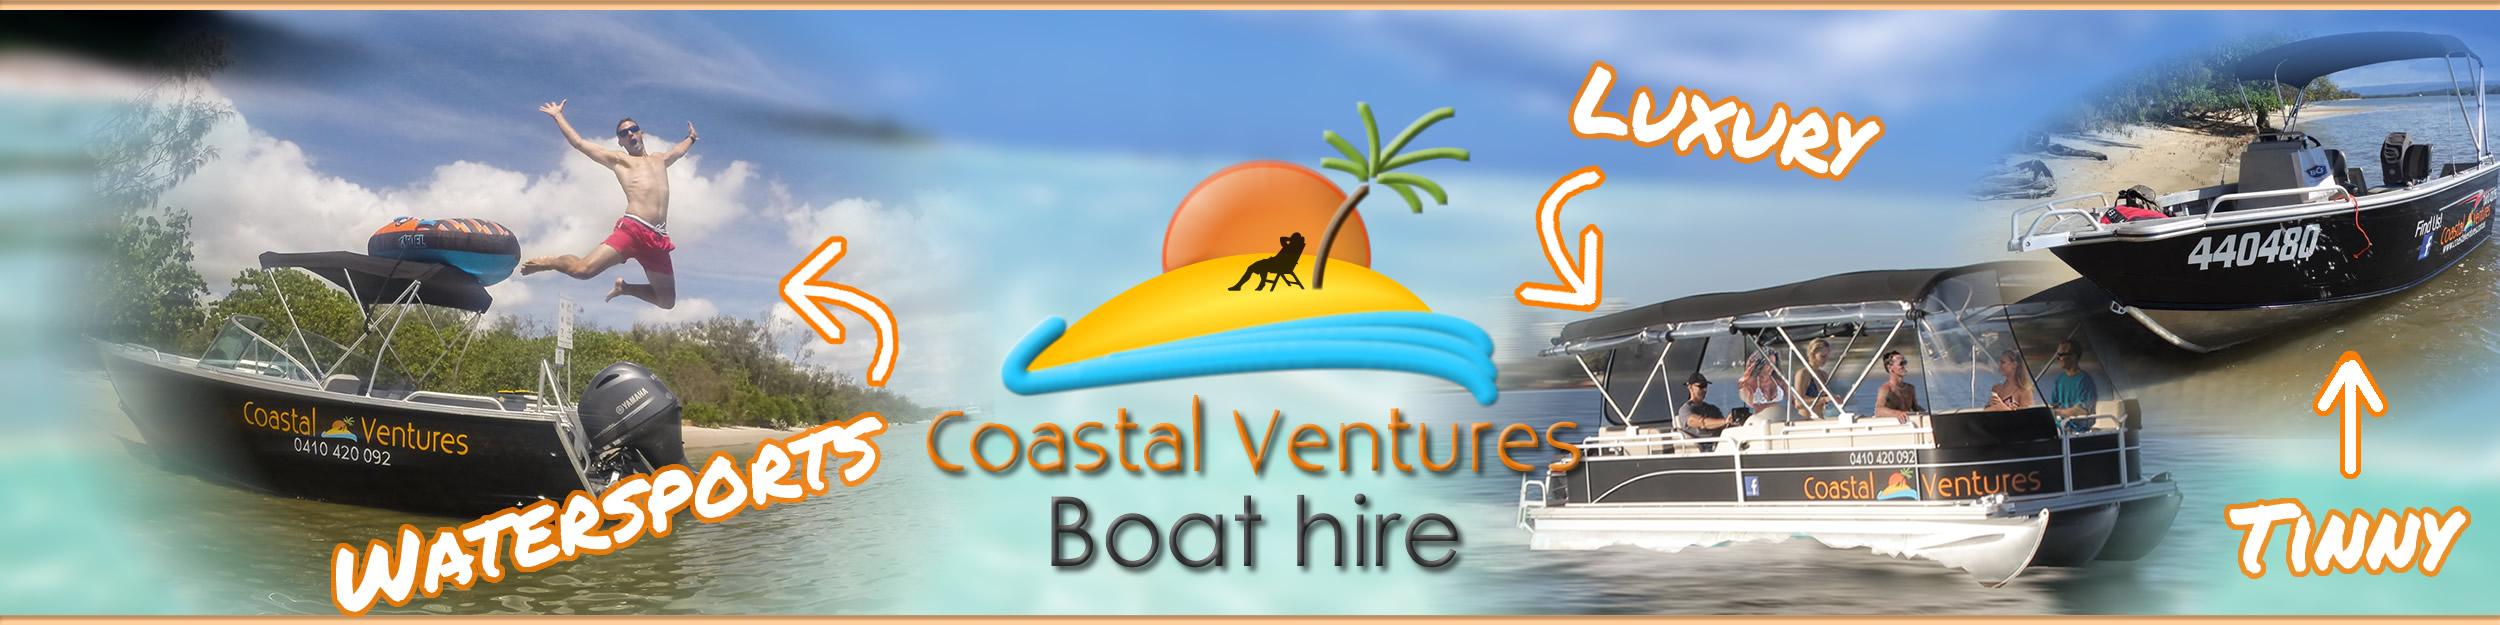 Coastal Ventures 🚤